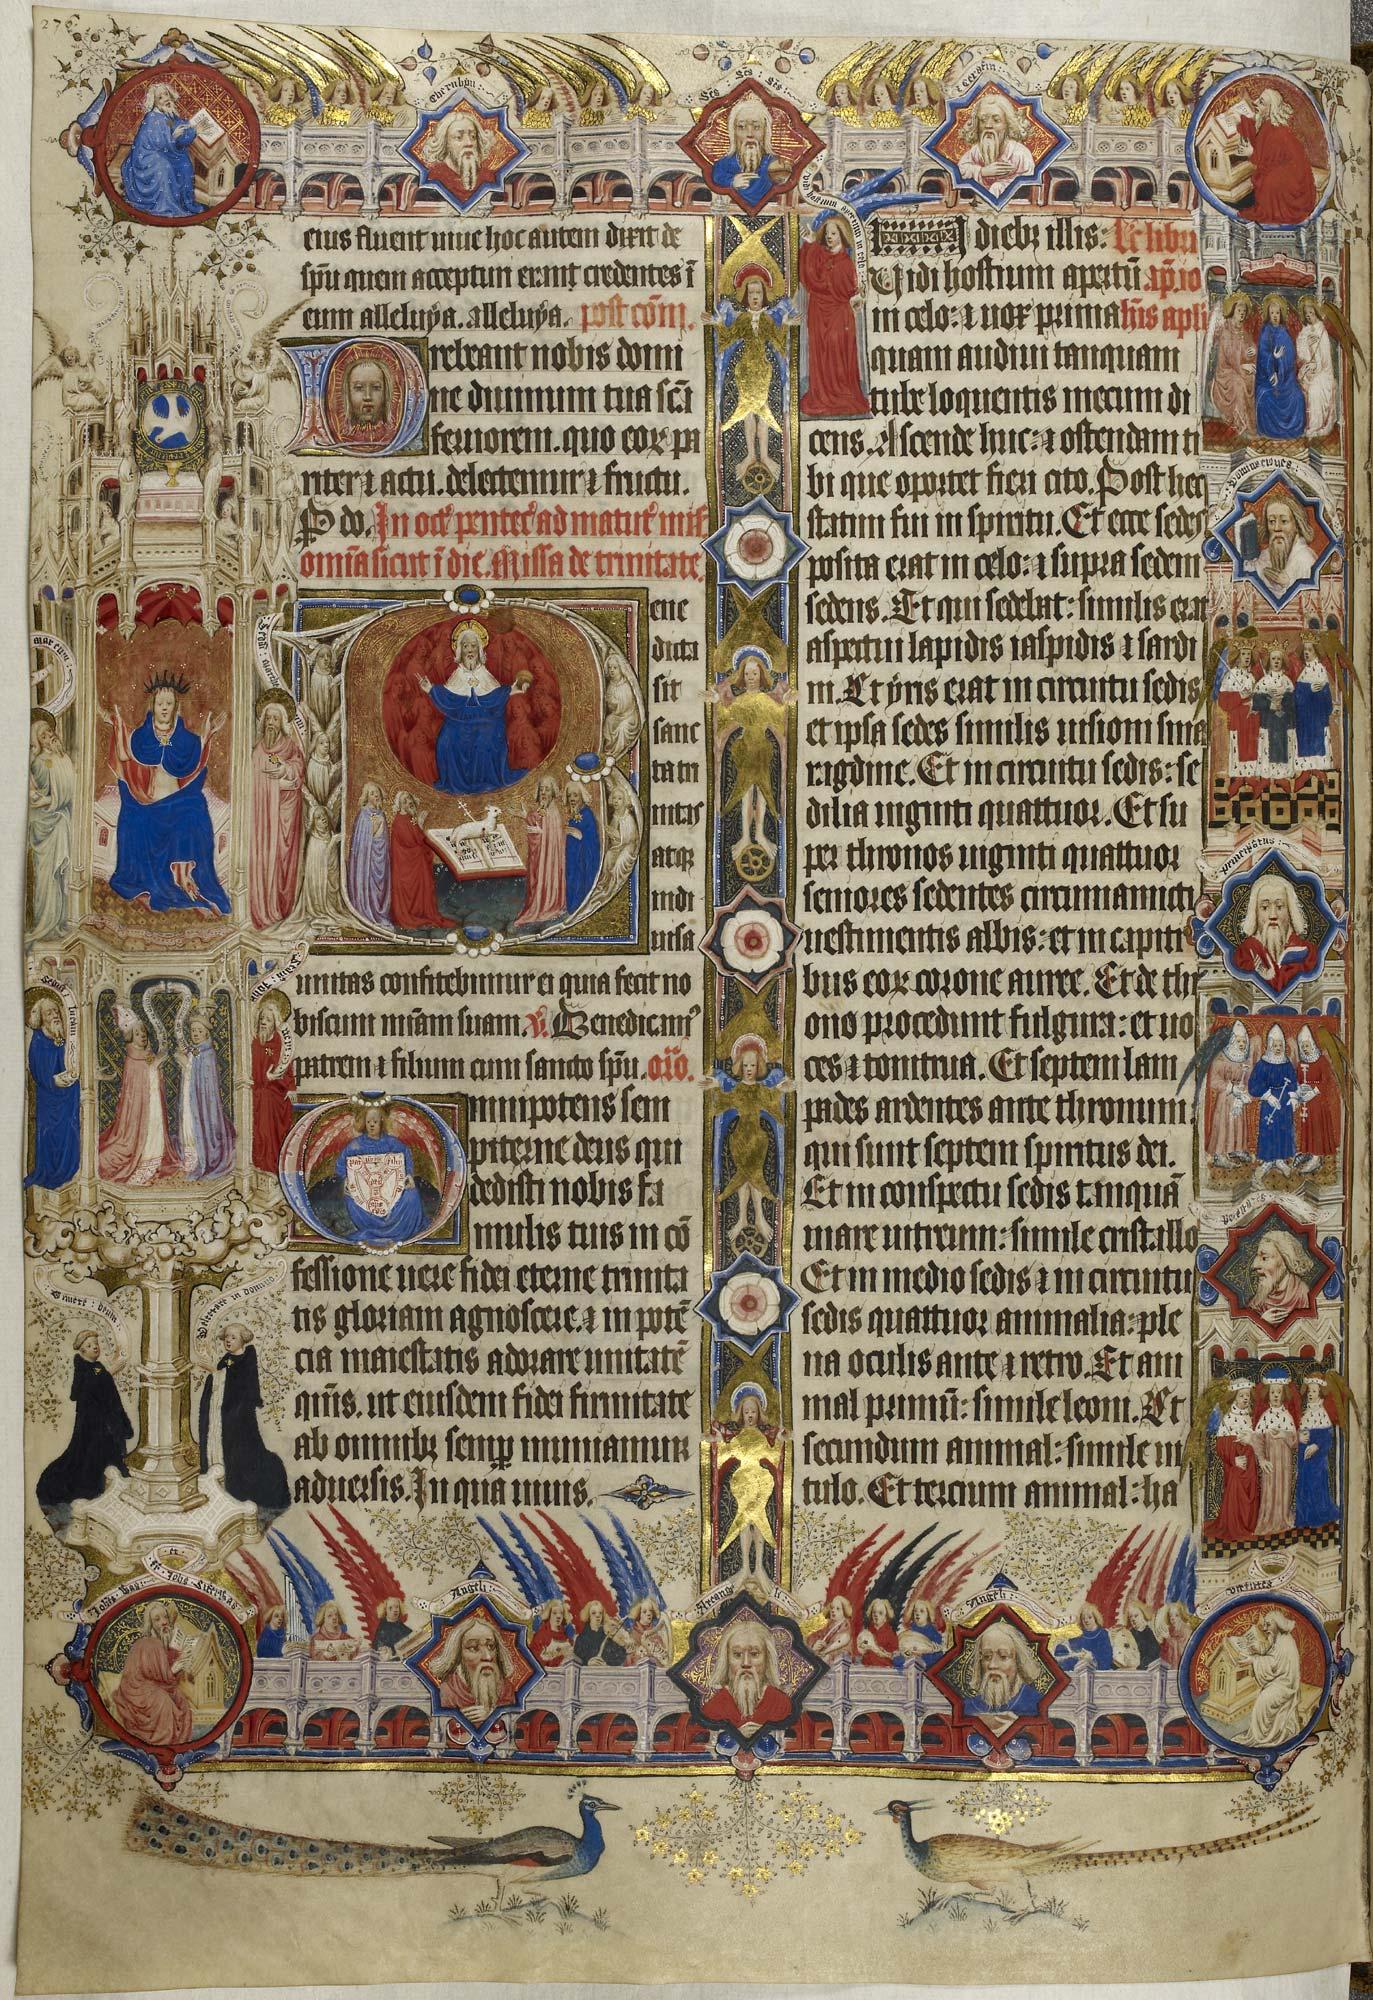 The Sherborne Missal f.276